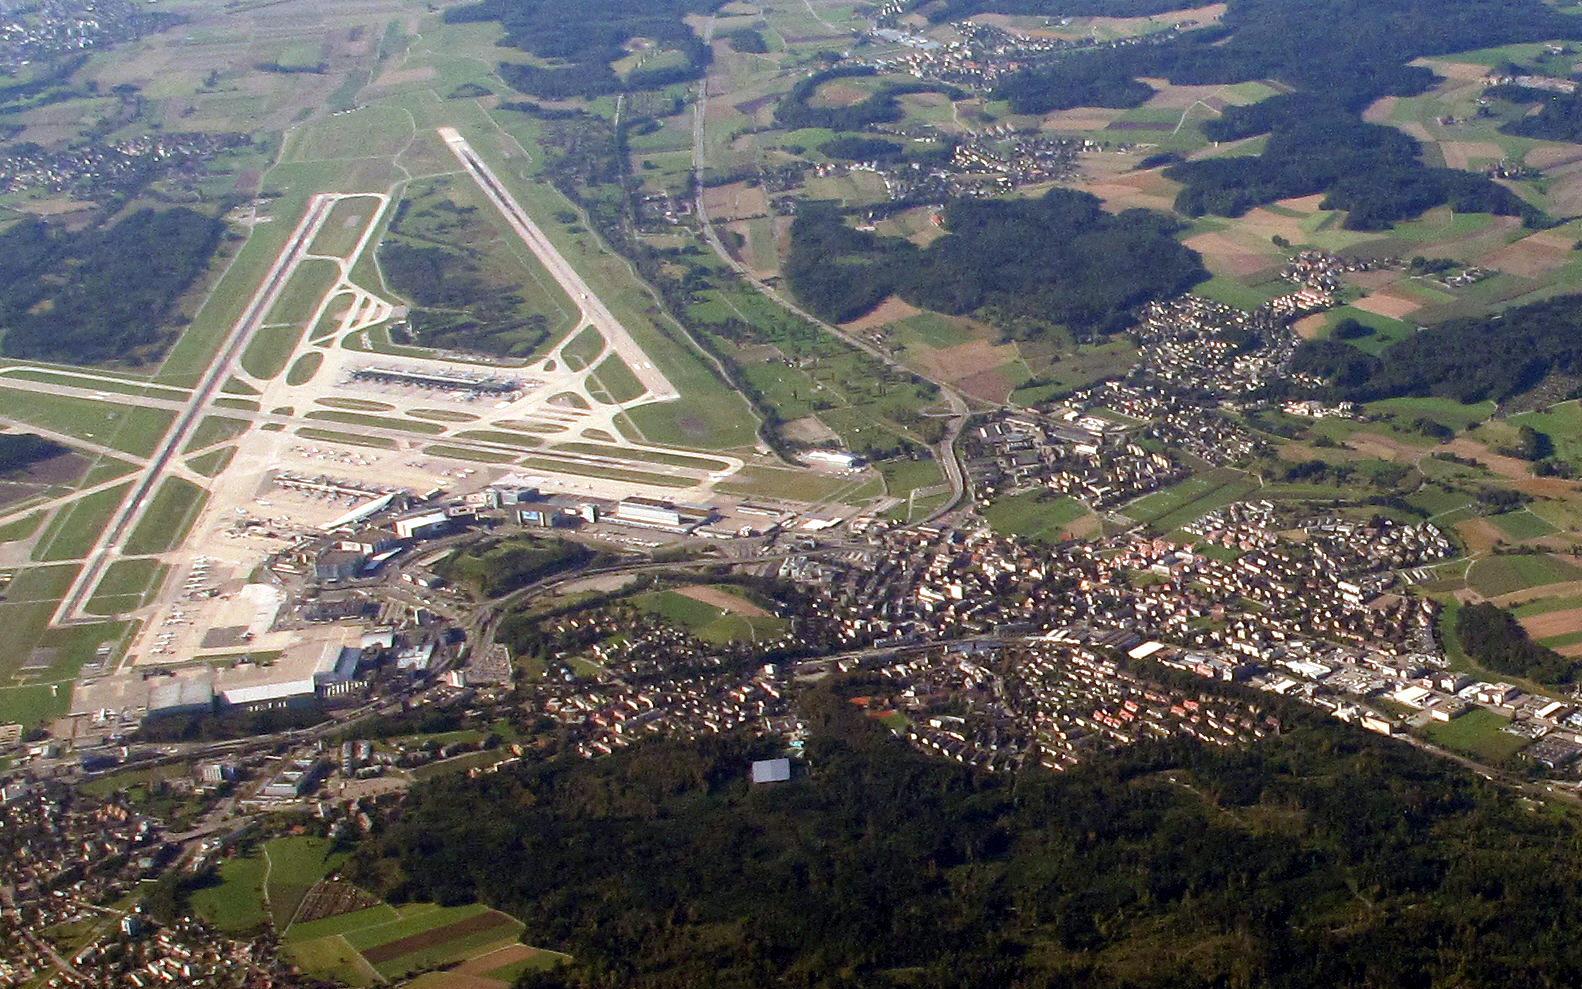 Aeroporto Zurigo Mappa : File zurich airport img b g wikimedia commons